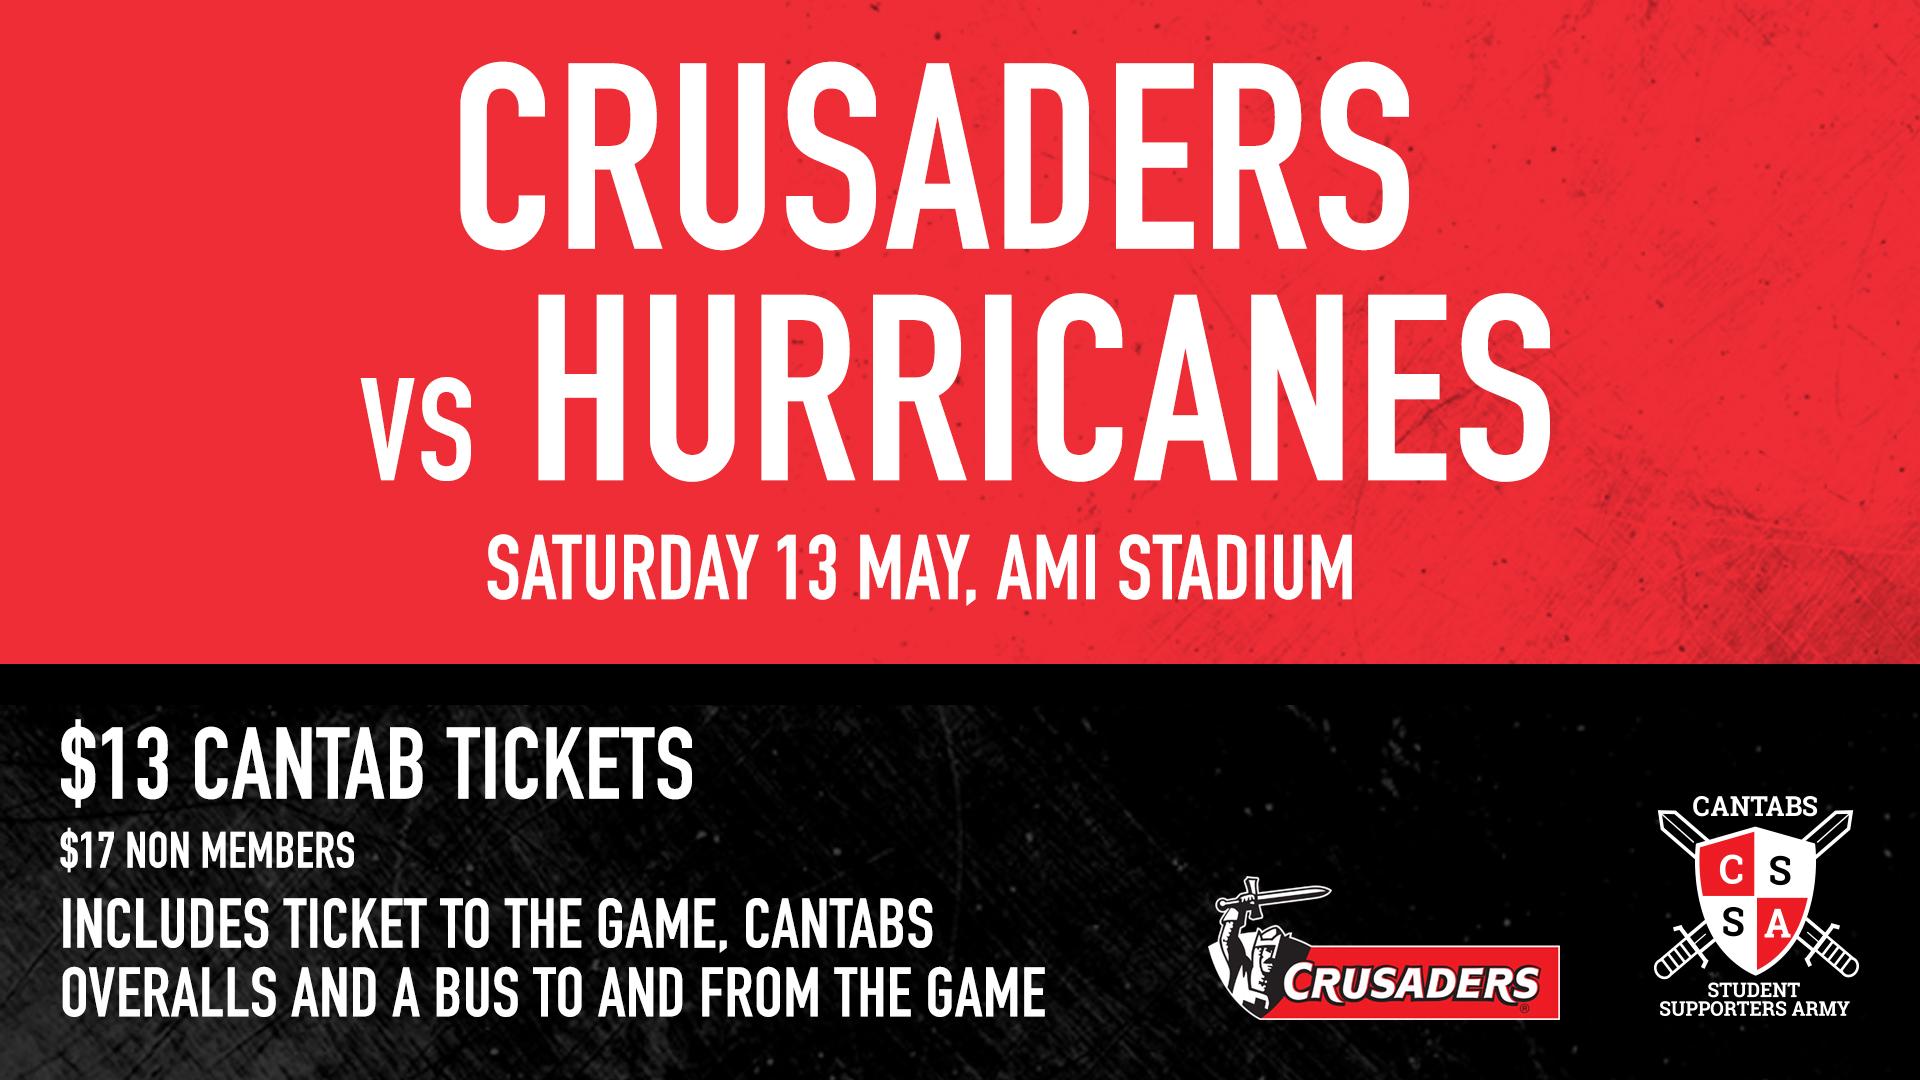 Crusaders vs Hurricanes alumni pre-match event